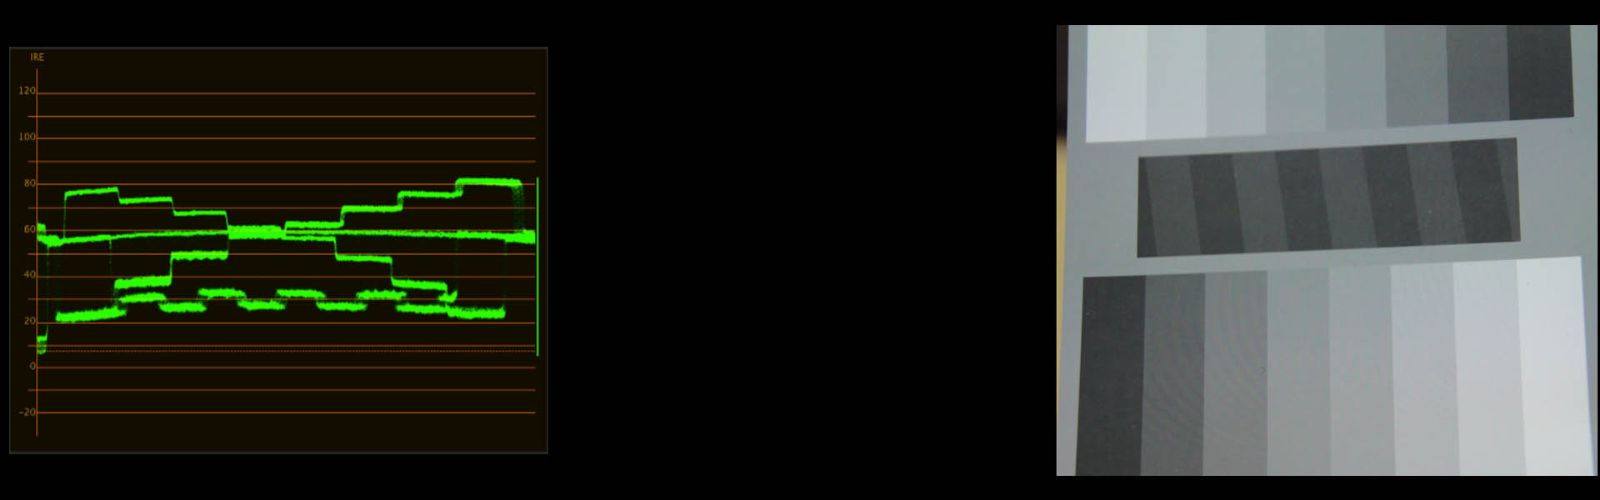 waveform showing decreased contrast